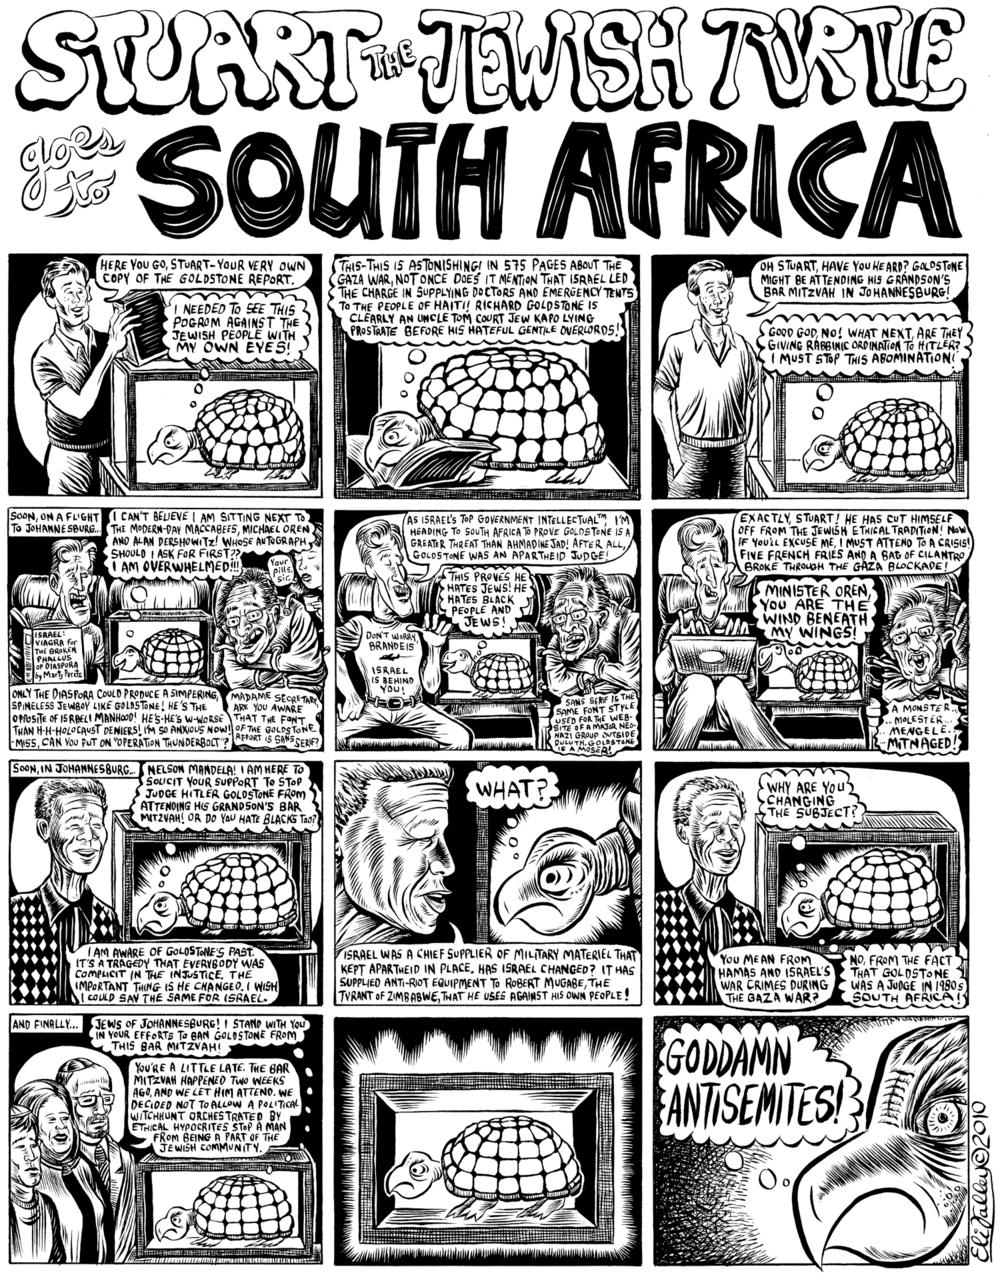 Stuart Turtle/S. Africa: Goldstone. Forward, 6/29/10